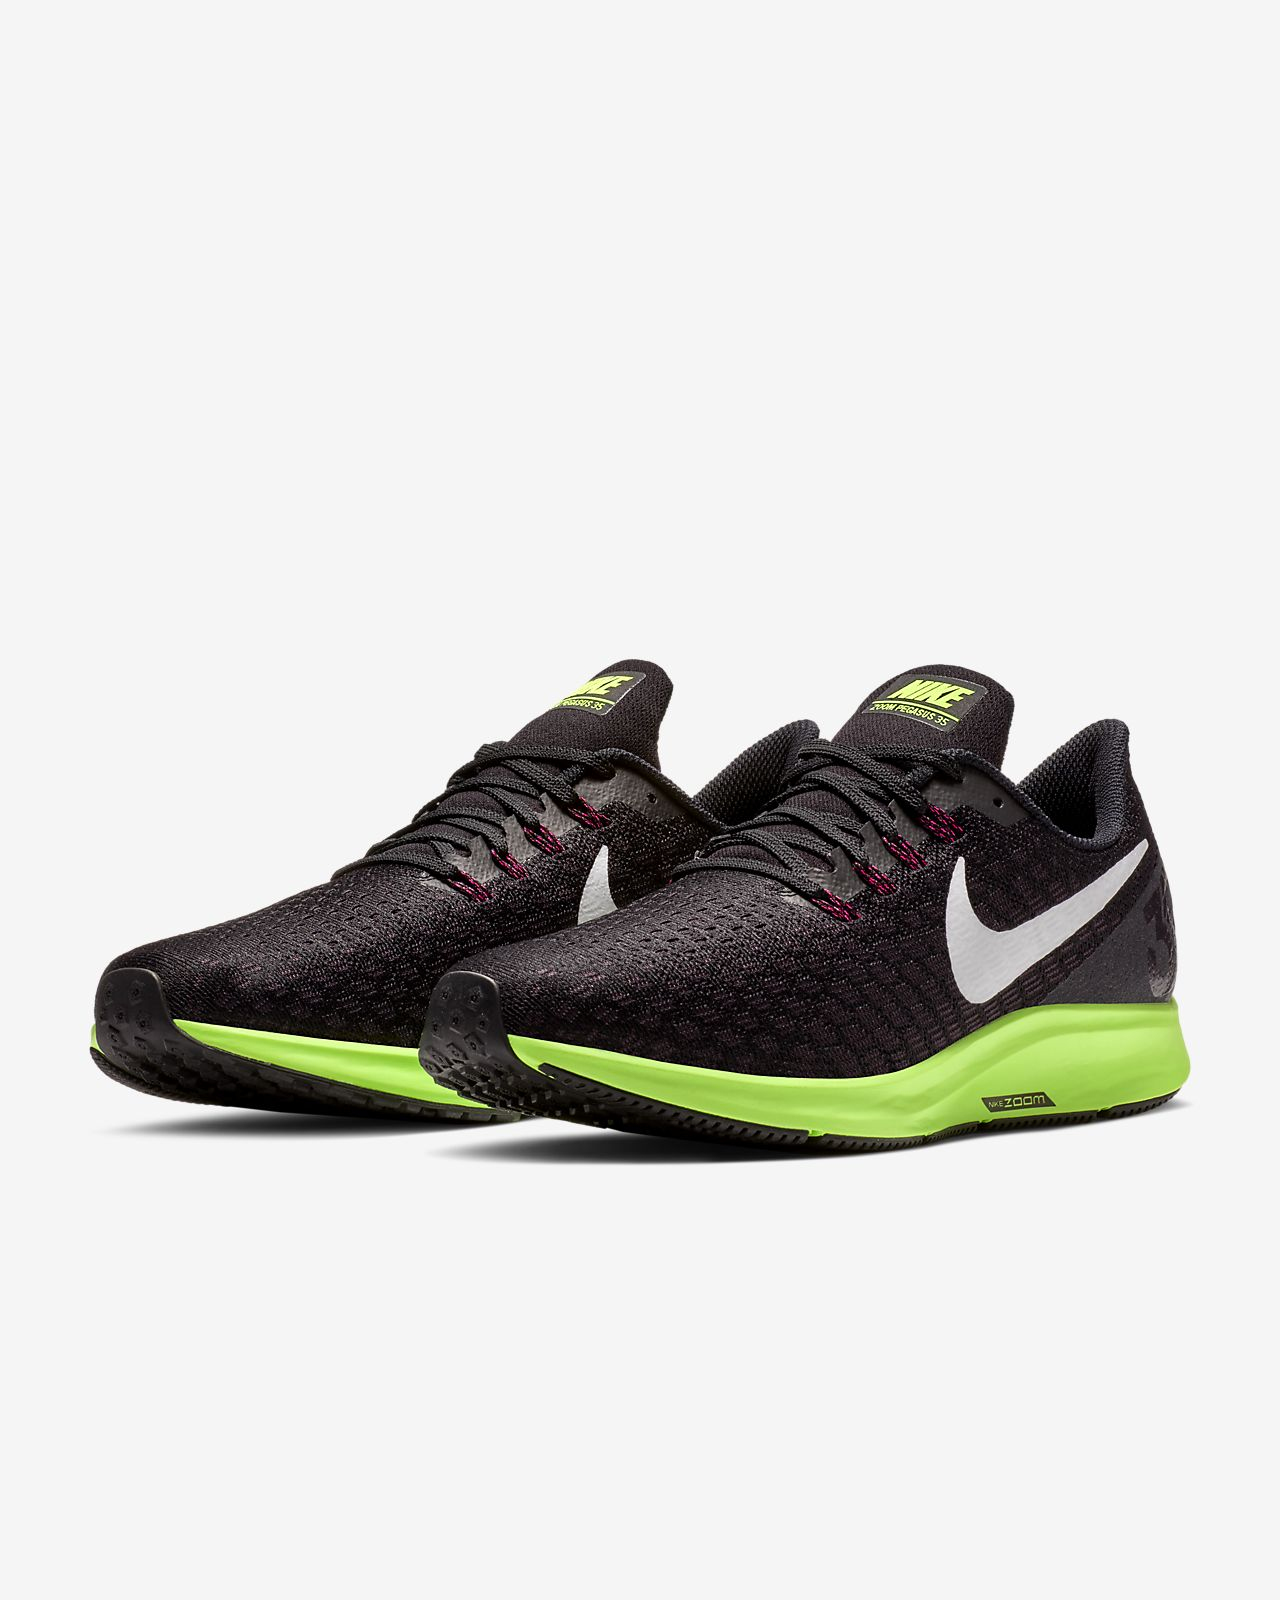 cheap for discount 0768c 37829 35 Air Nike Scarpa Zoom Da Uomo Pegasus Ch Running xwZqUtqSY